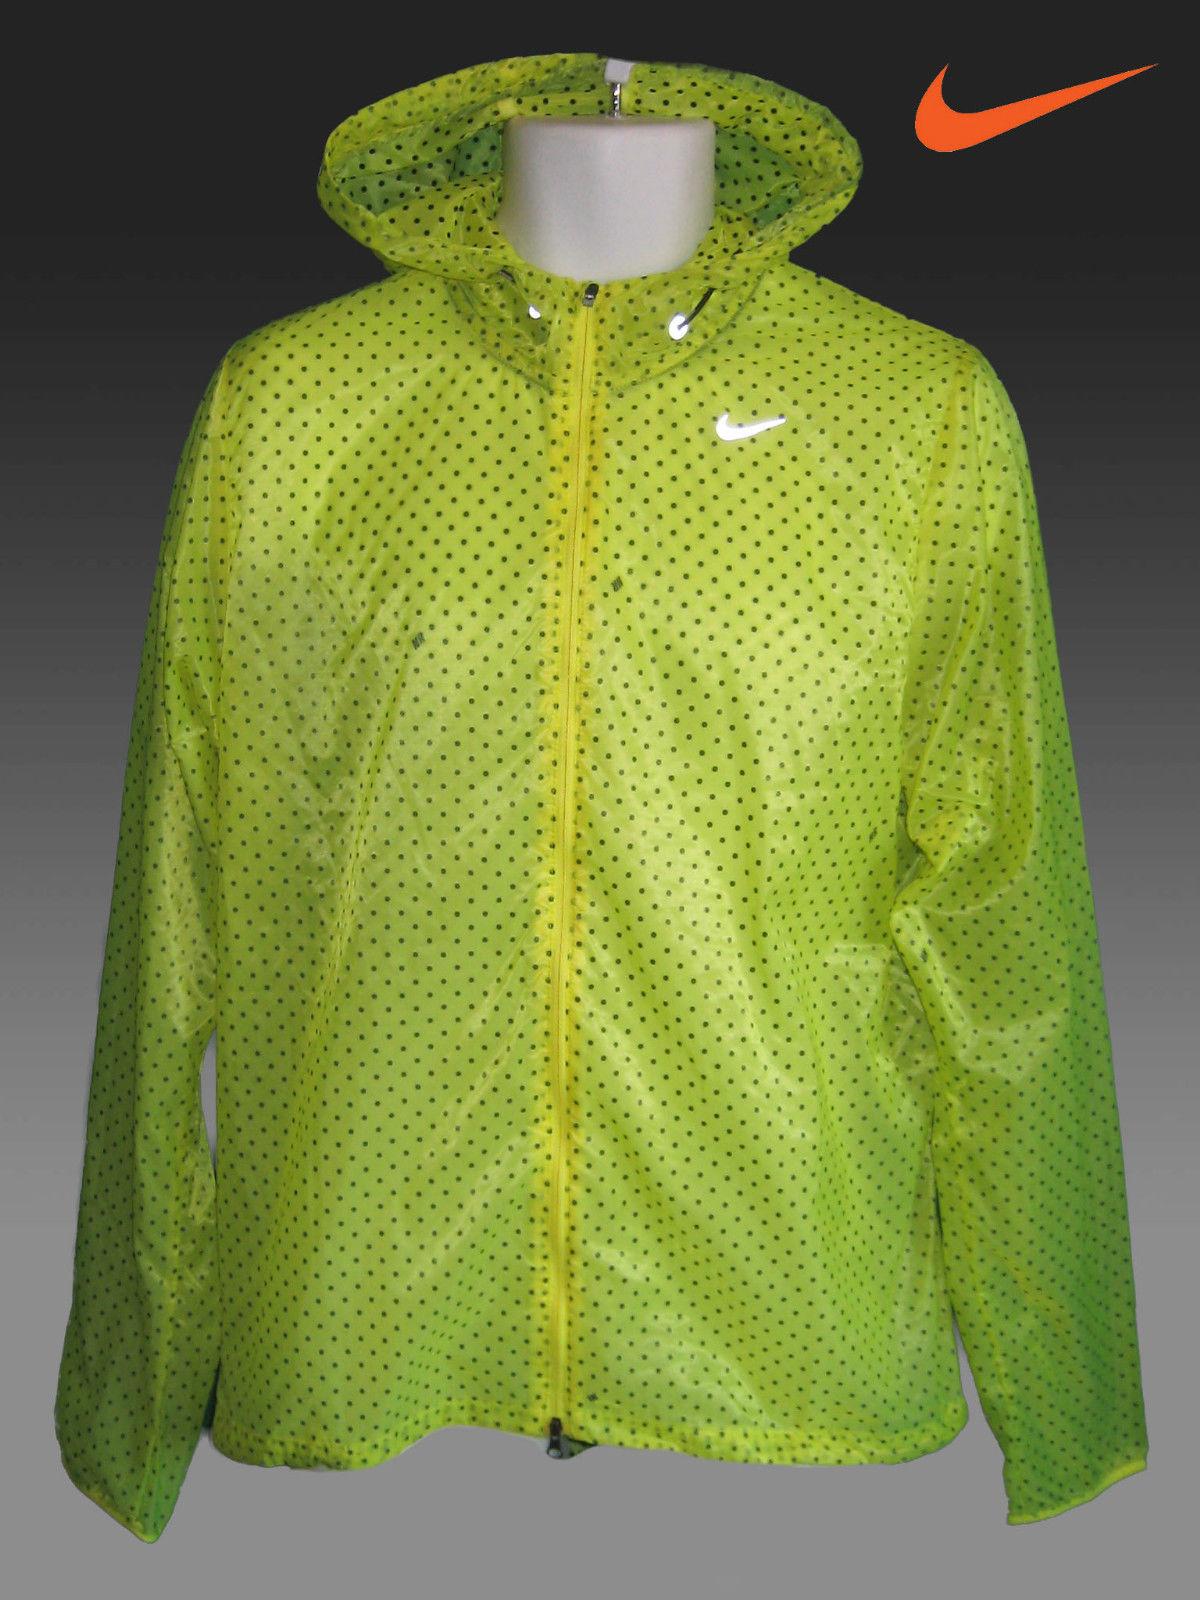 Nike running rain jacket